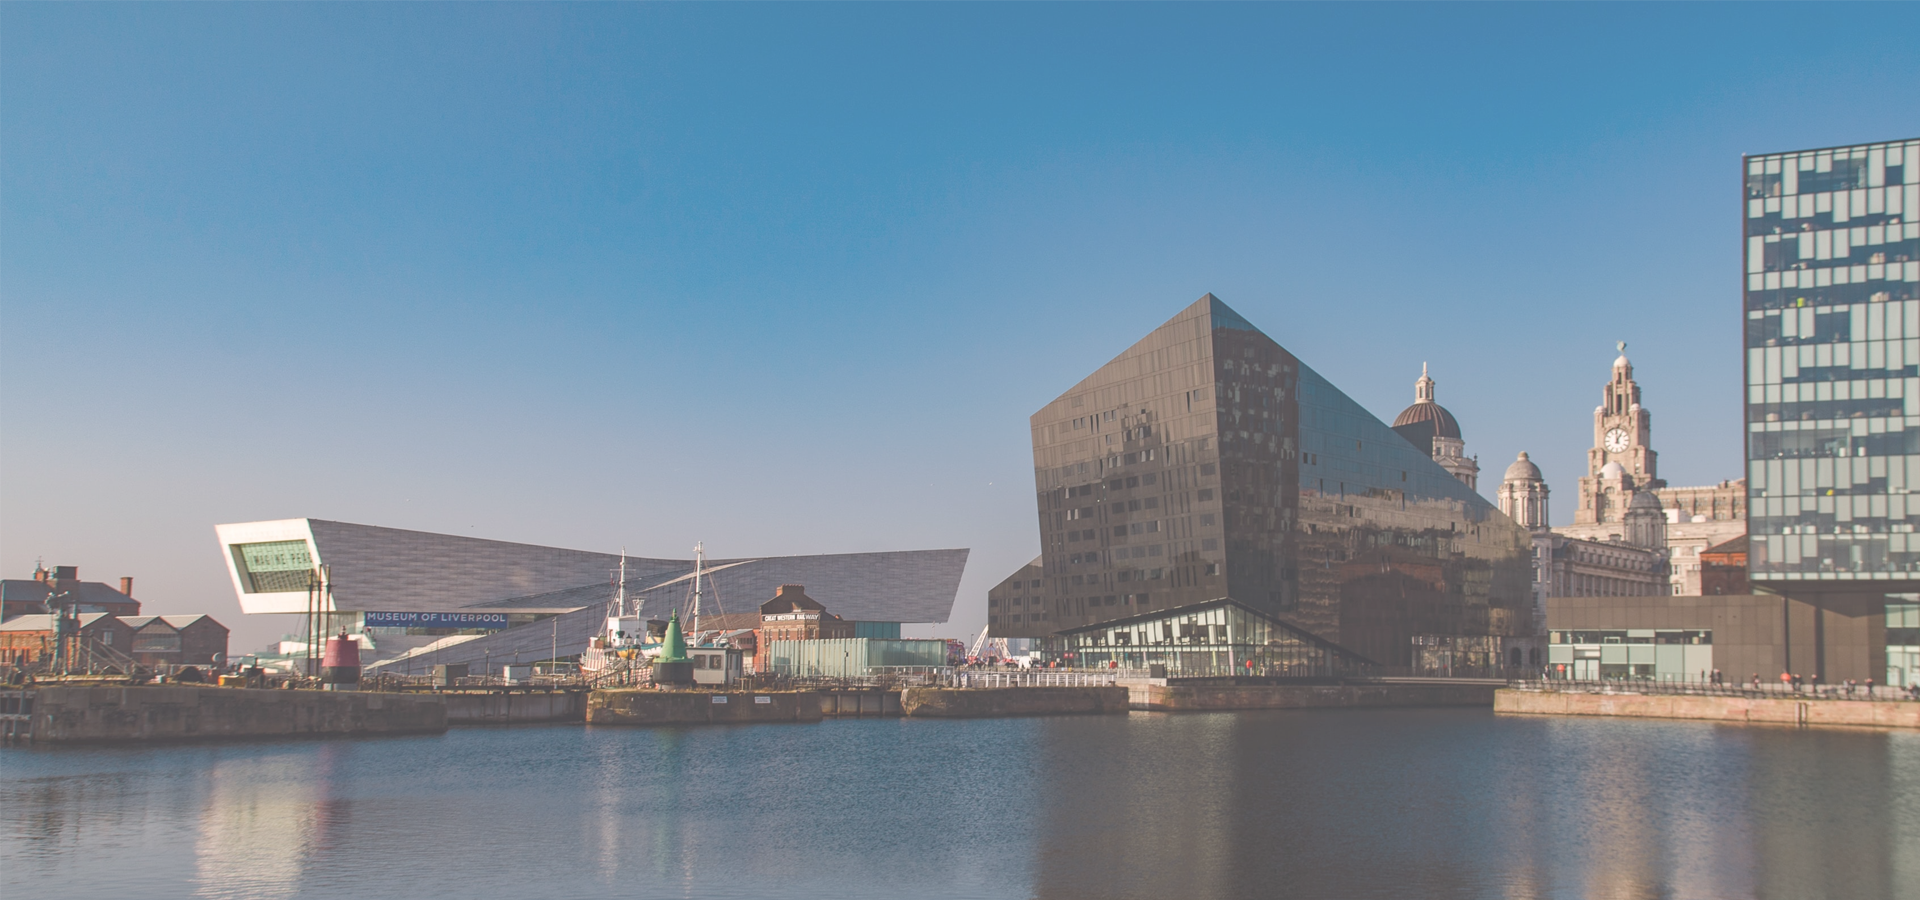 Peer-to-peer advisory in Liverpool, England, Great Britain